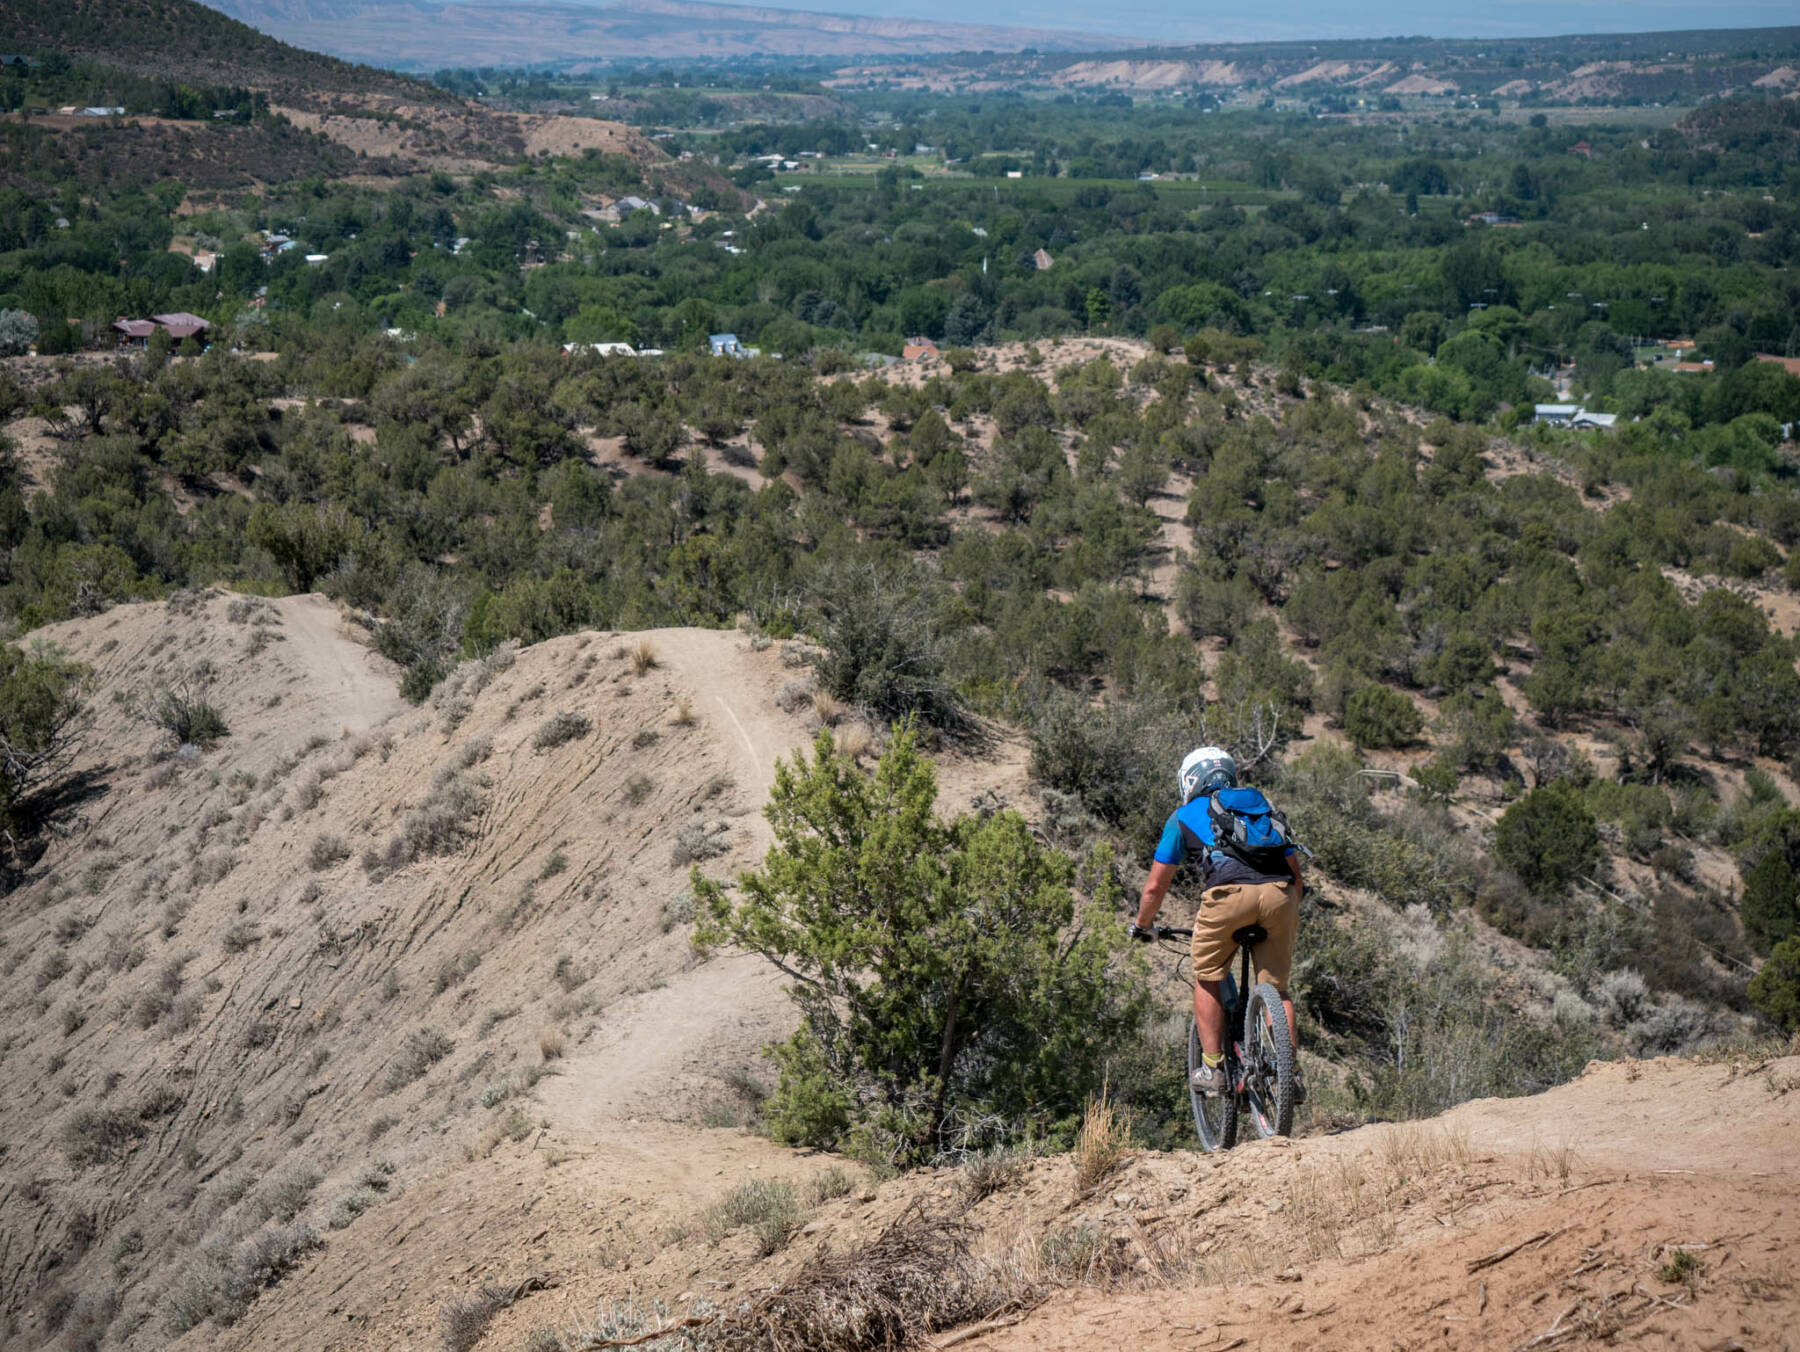 Downhill singletrack? No problem!